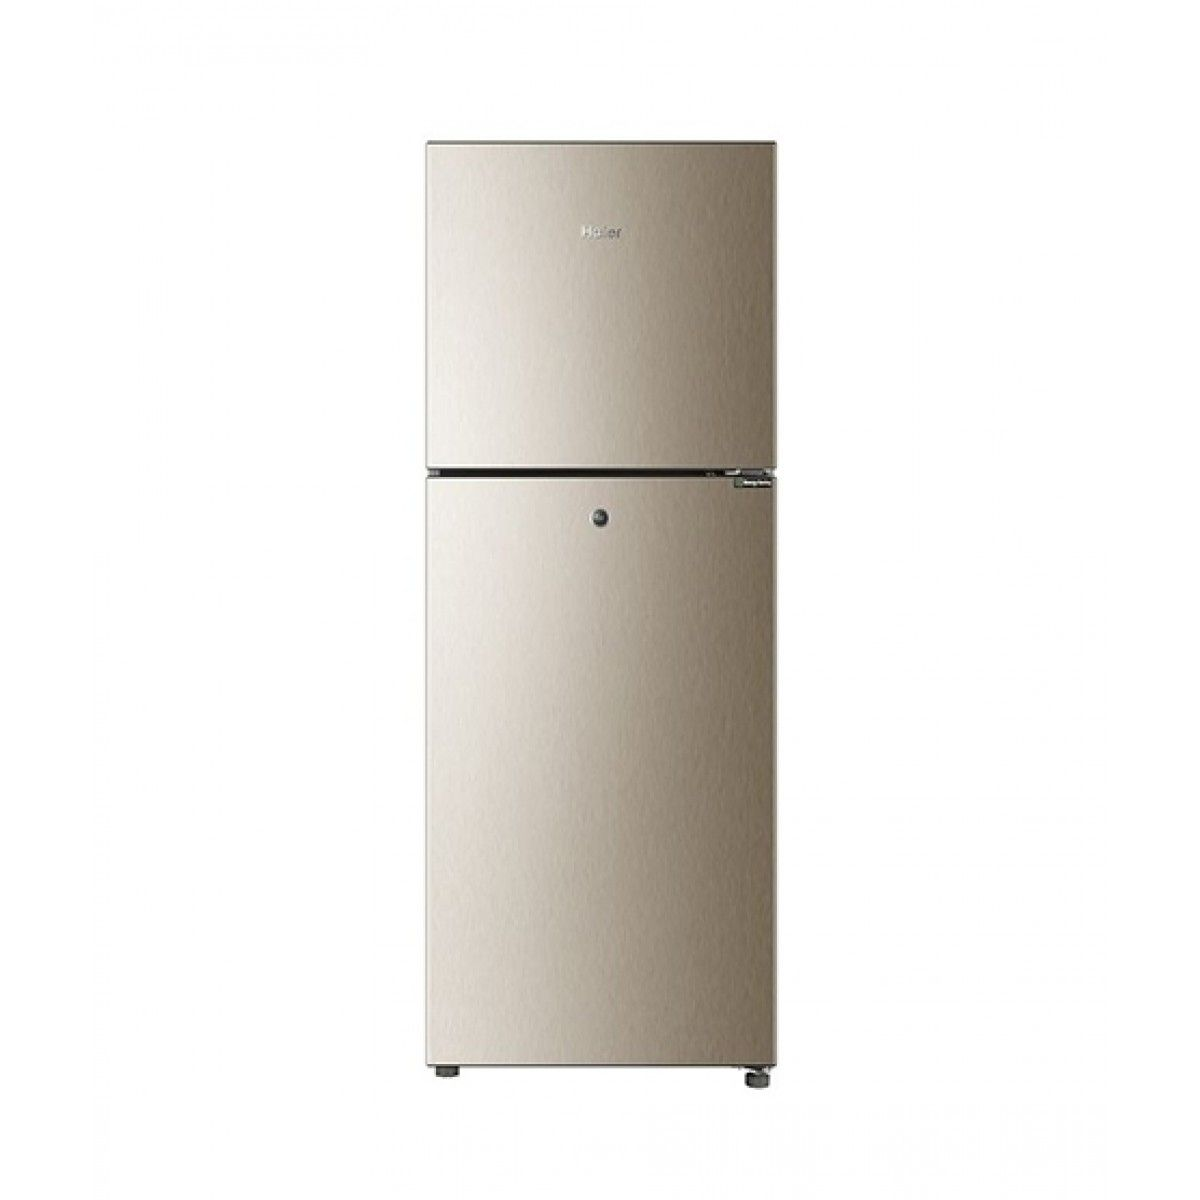 Haier HRF-336EBD 10 Cu Ft Refrigerator